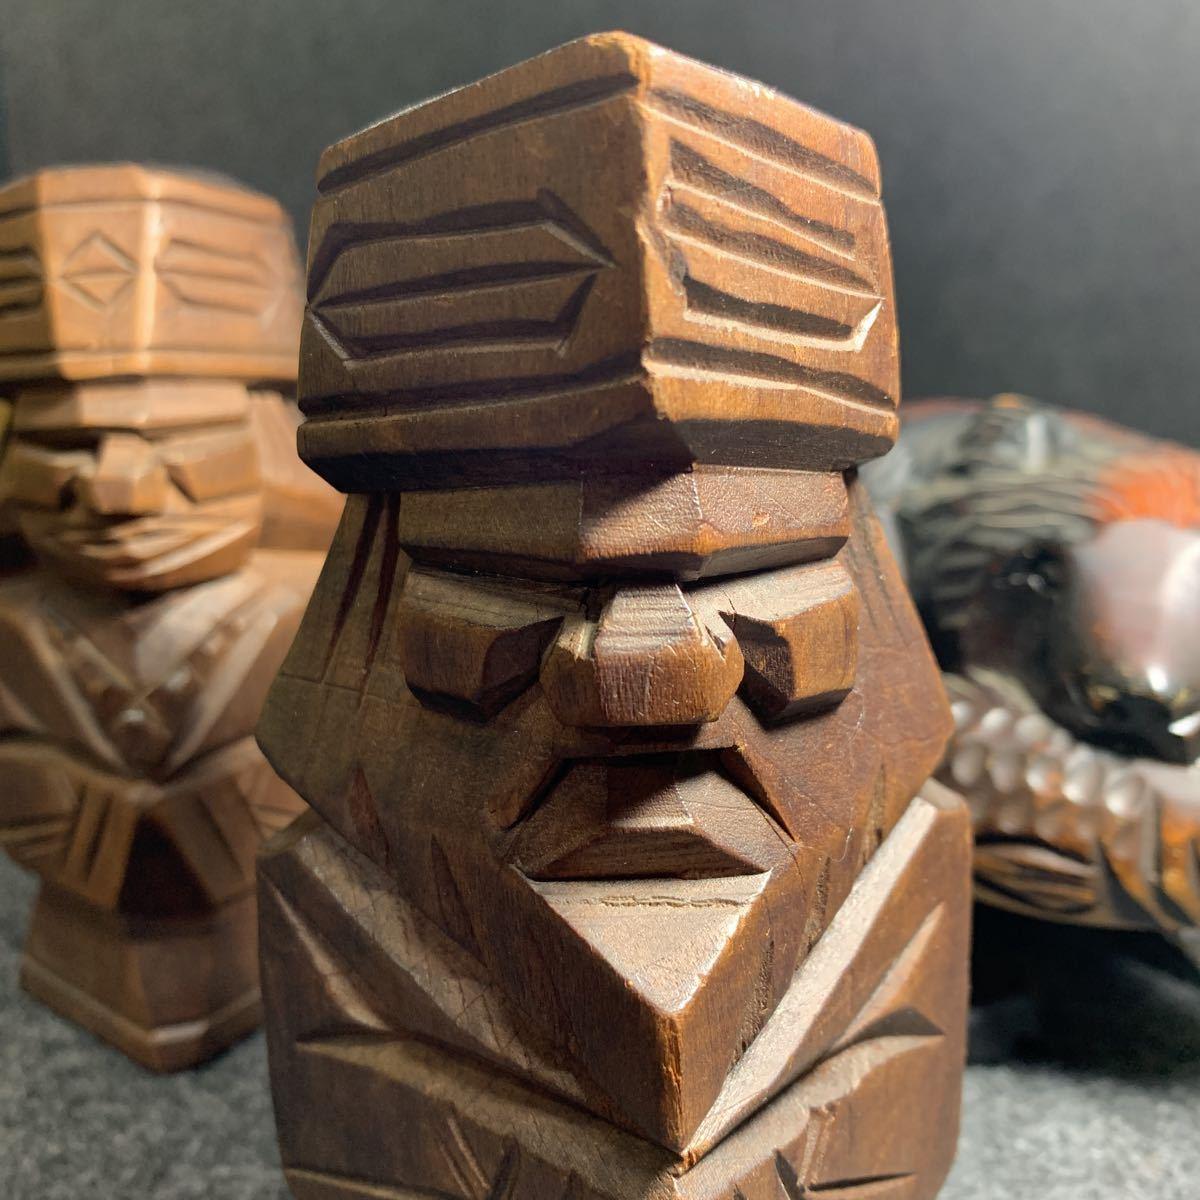 R0068 北海道 民芸品 ニポポ人形 木彫り熊 コラボ アイヌ民族 アイヌ人形 伝統工芸 北海三昧_画像8